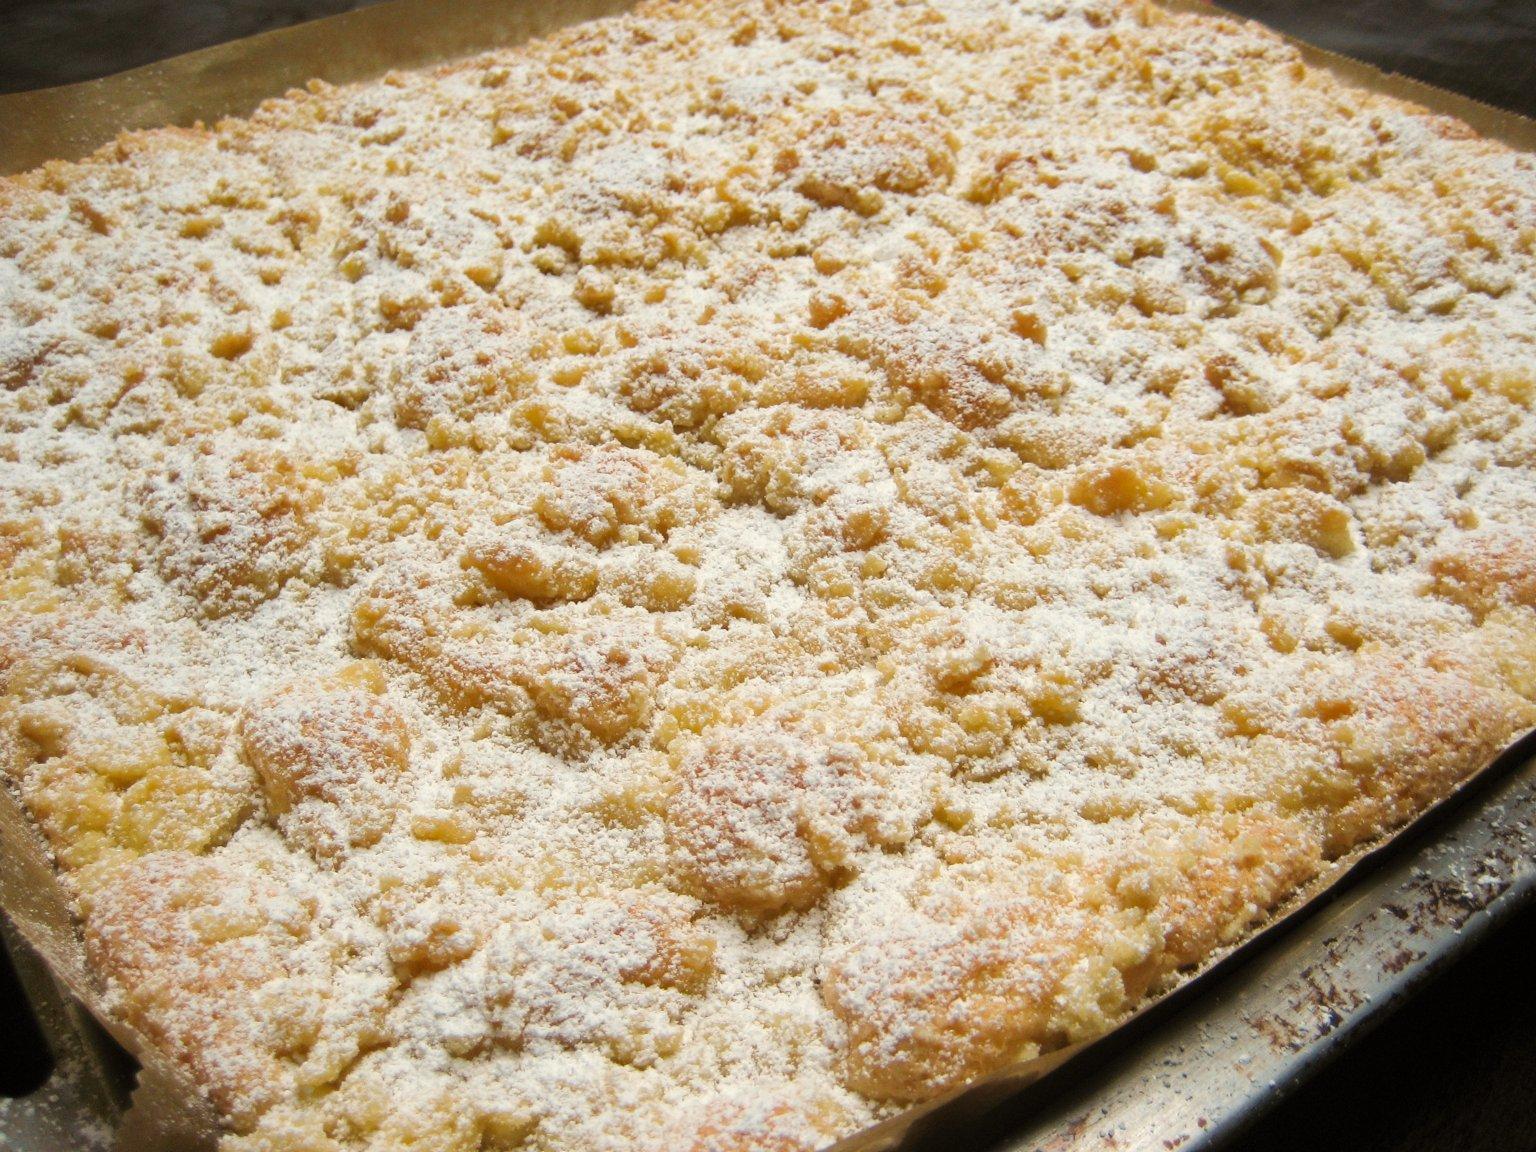 Ratz-Fatz Streuselkuchen. crumble/streusel cake from gingerlemonandspice